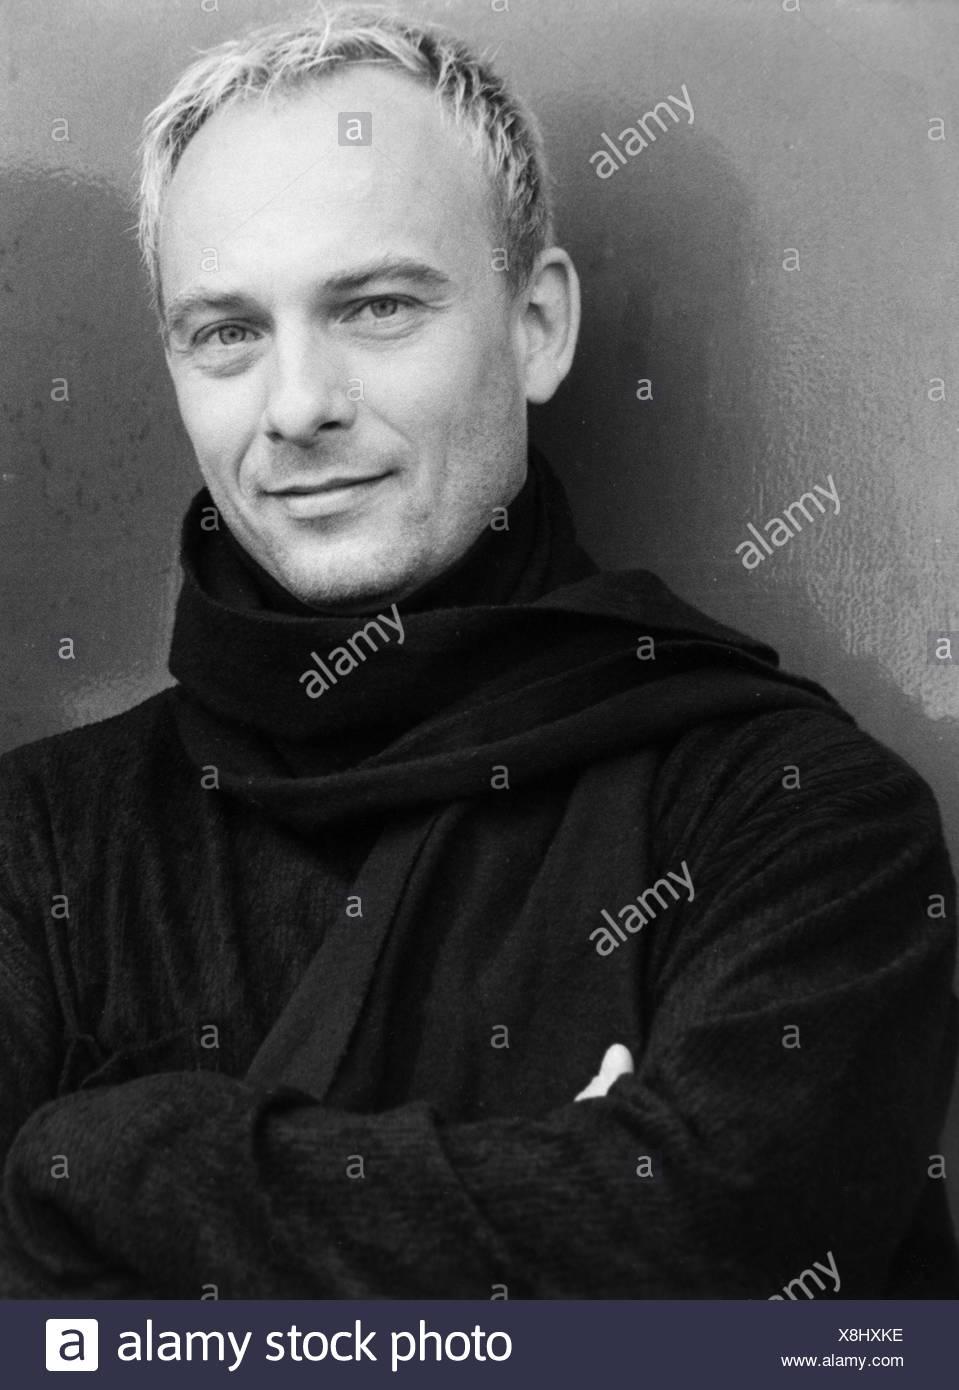 Fessler, Peter, deutscher Musiker (Sänger), Portrait, Foto, Stuttgart, 1998, Additional-Rights-Spiel-NA Stockbild